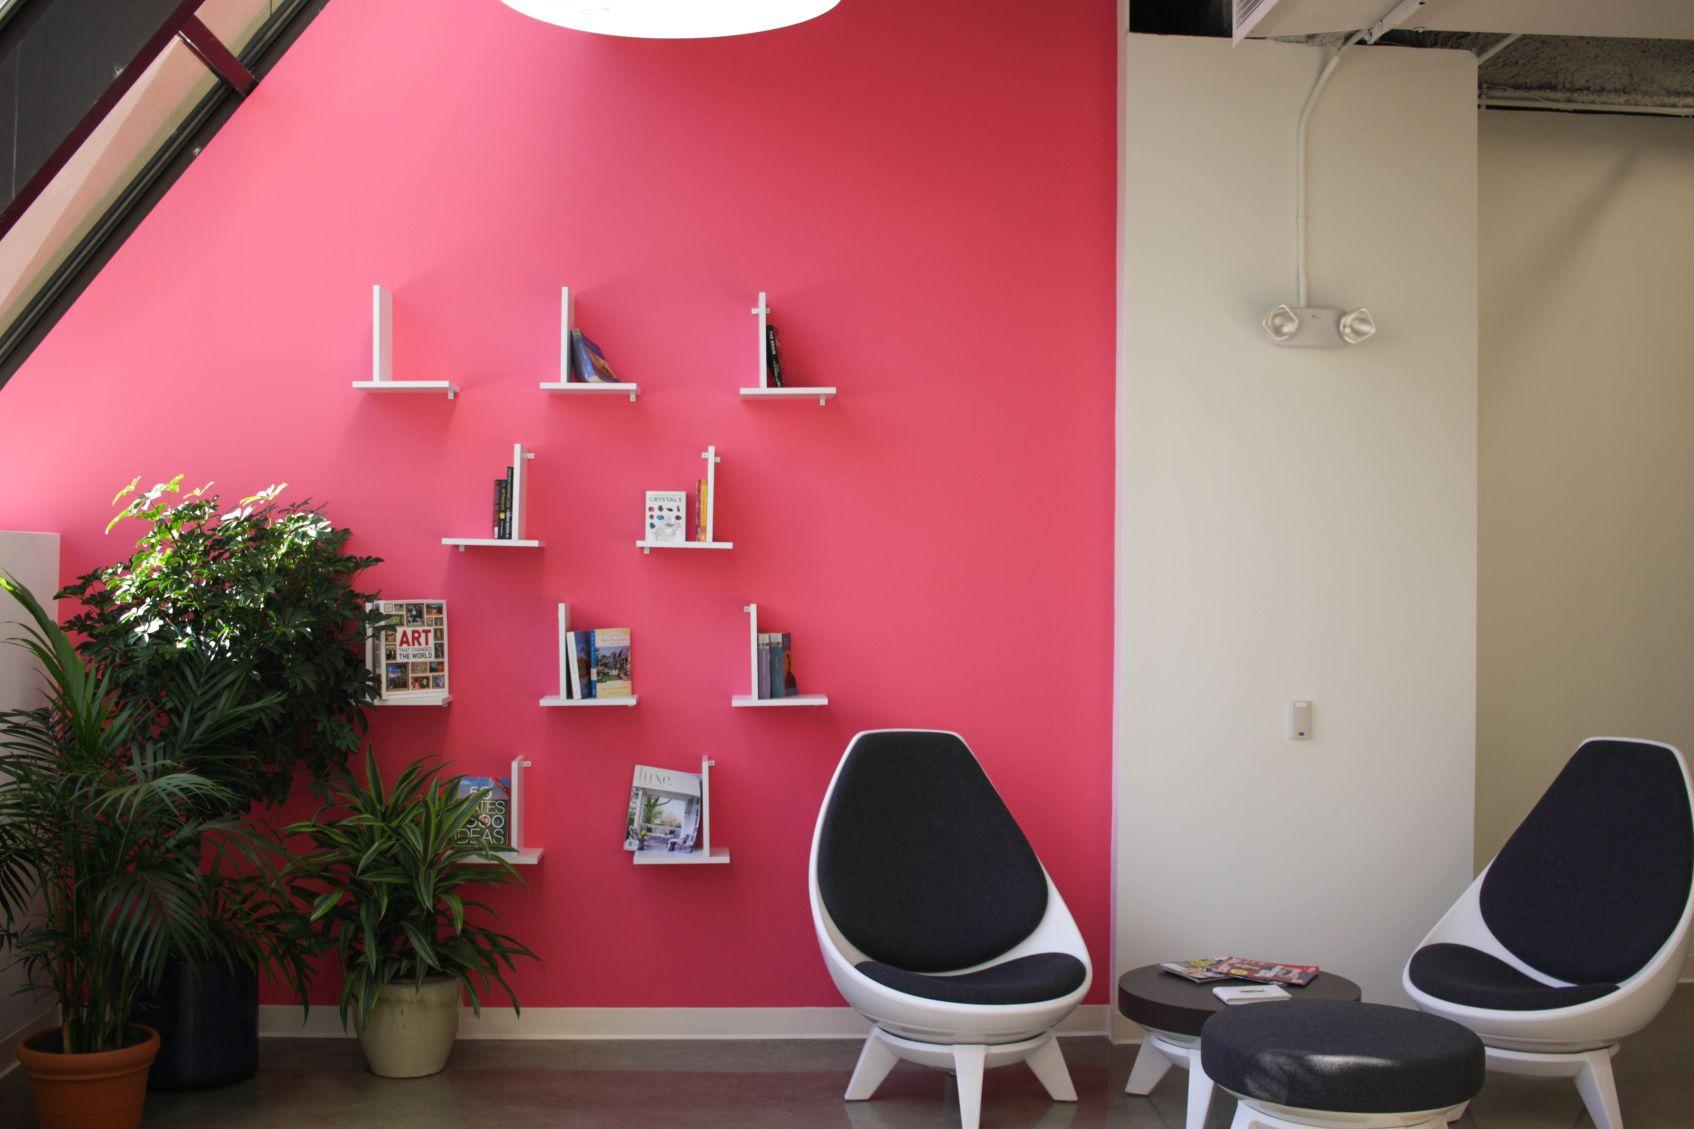 e3d155d3881be4 modne kolory scian w mieszkaniu jak pomalowac salon pomysly aranzacje  inspiracje dekoportal